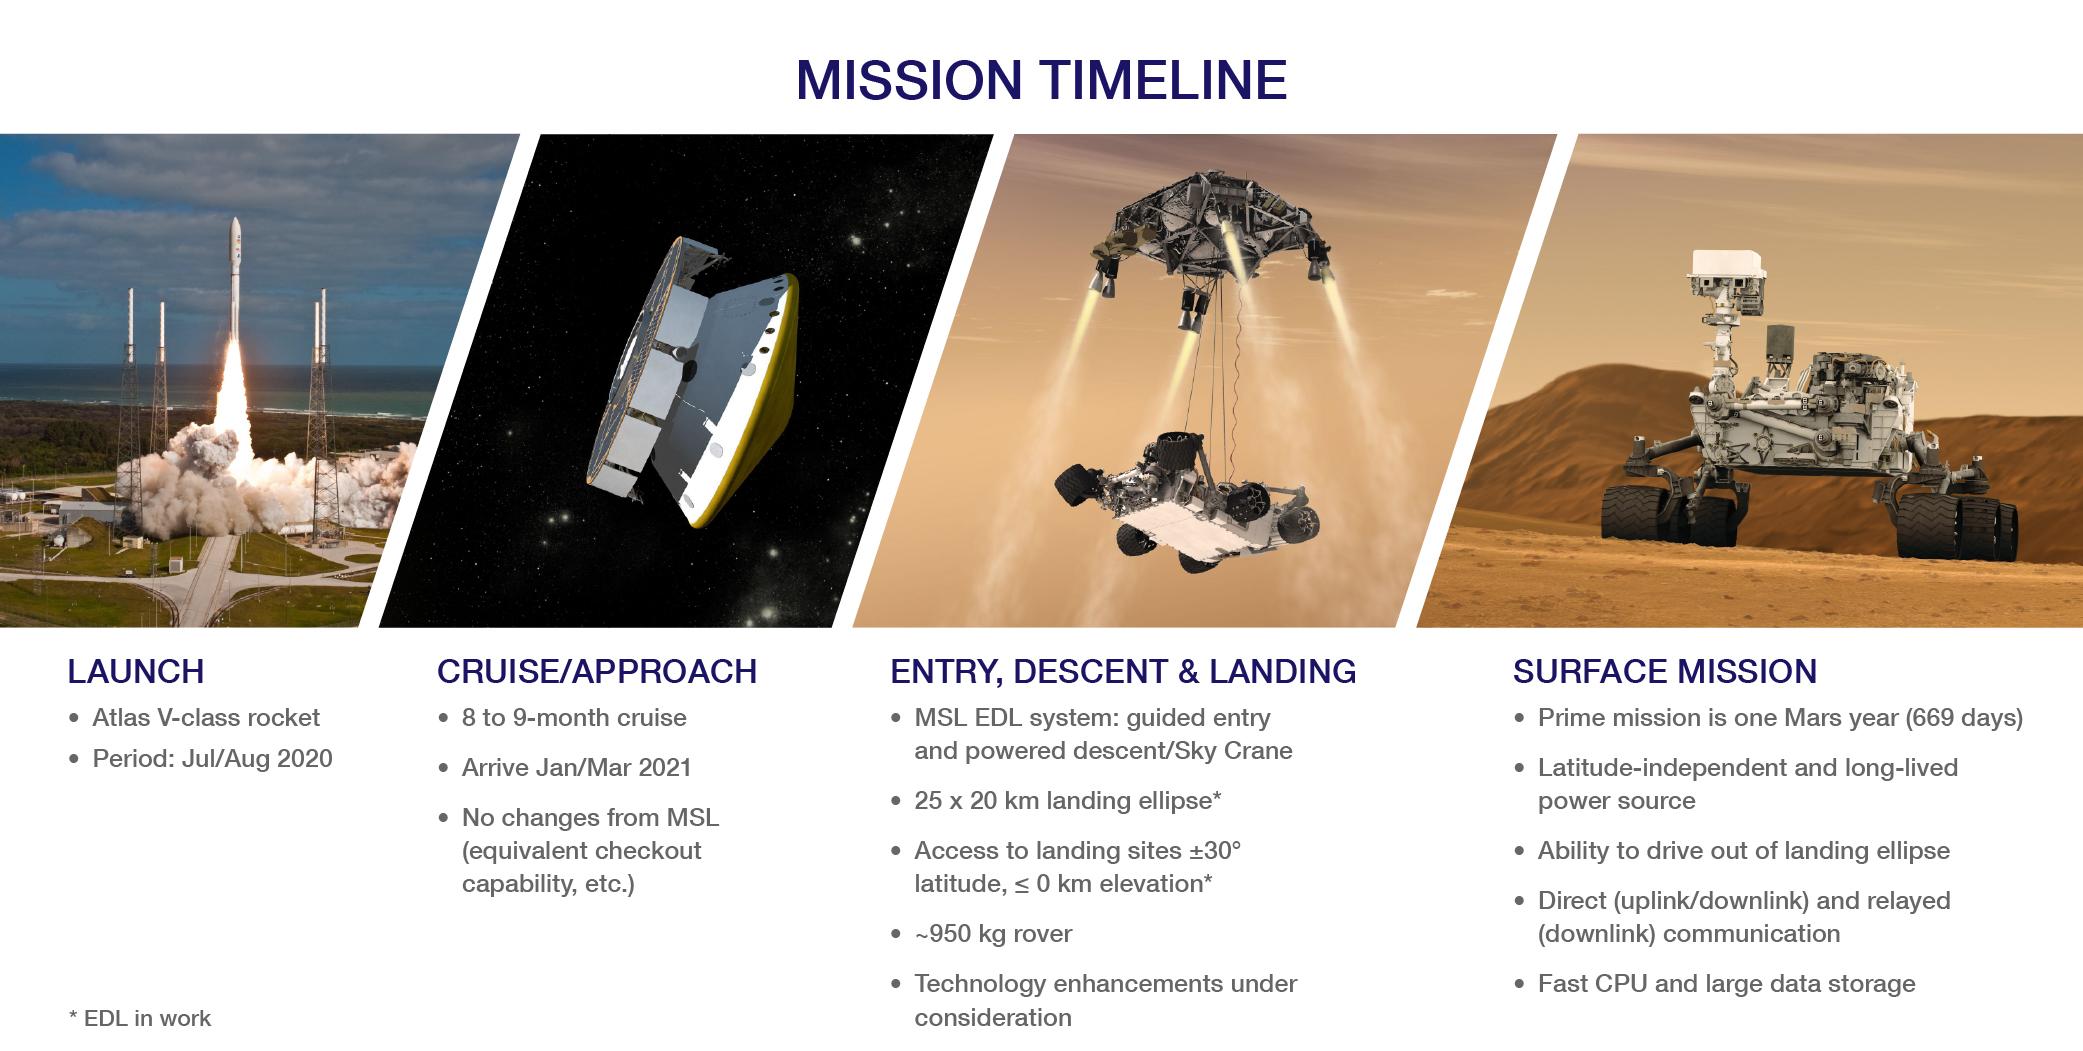 nasa missions timeline - photo #31